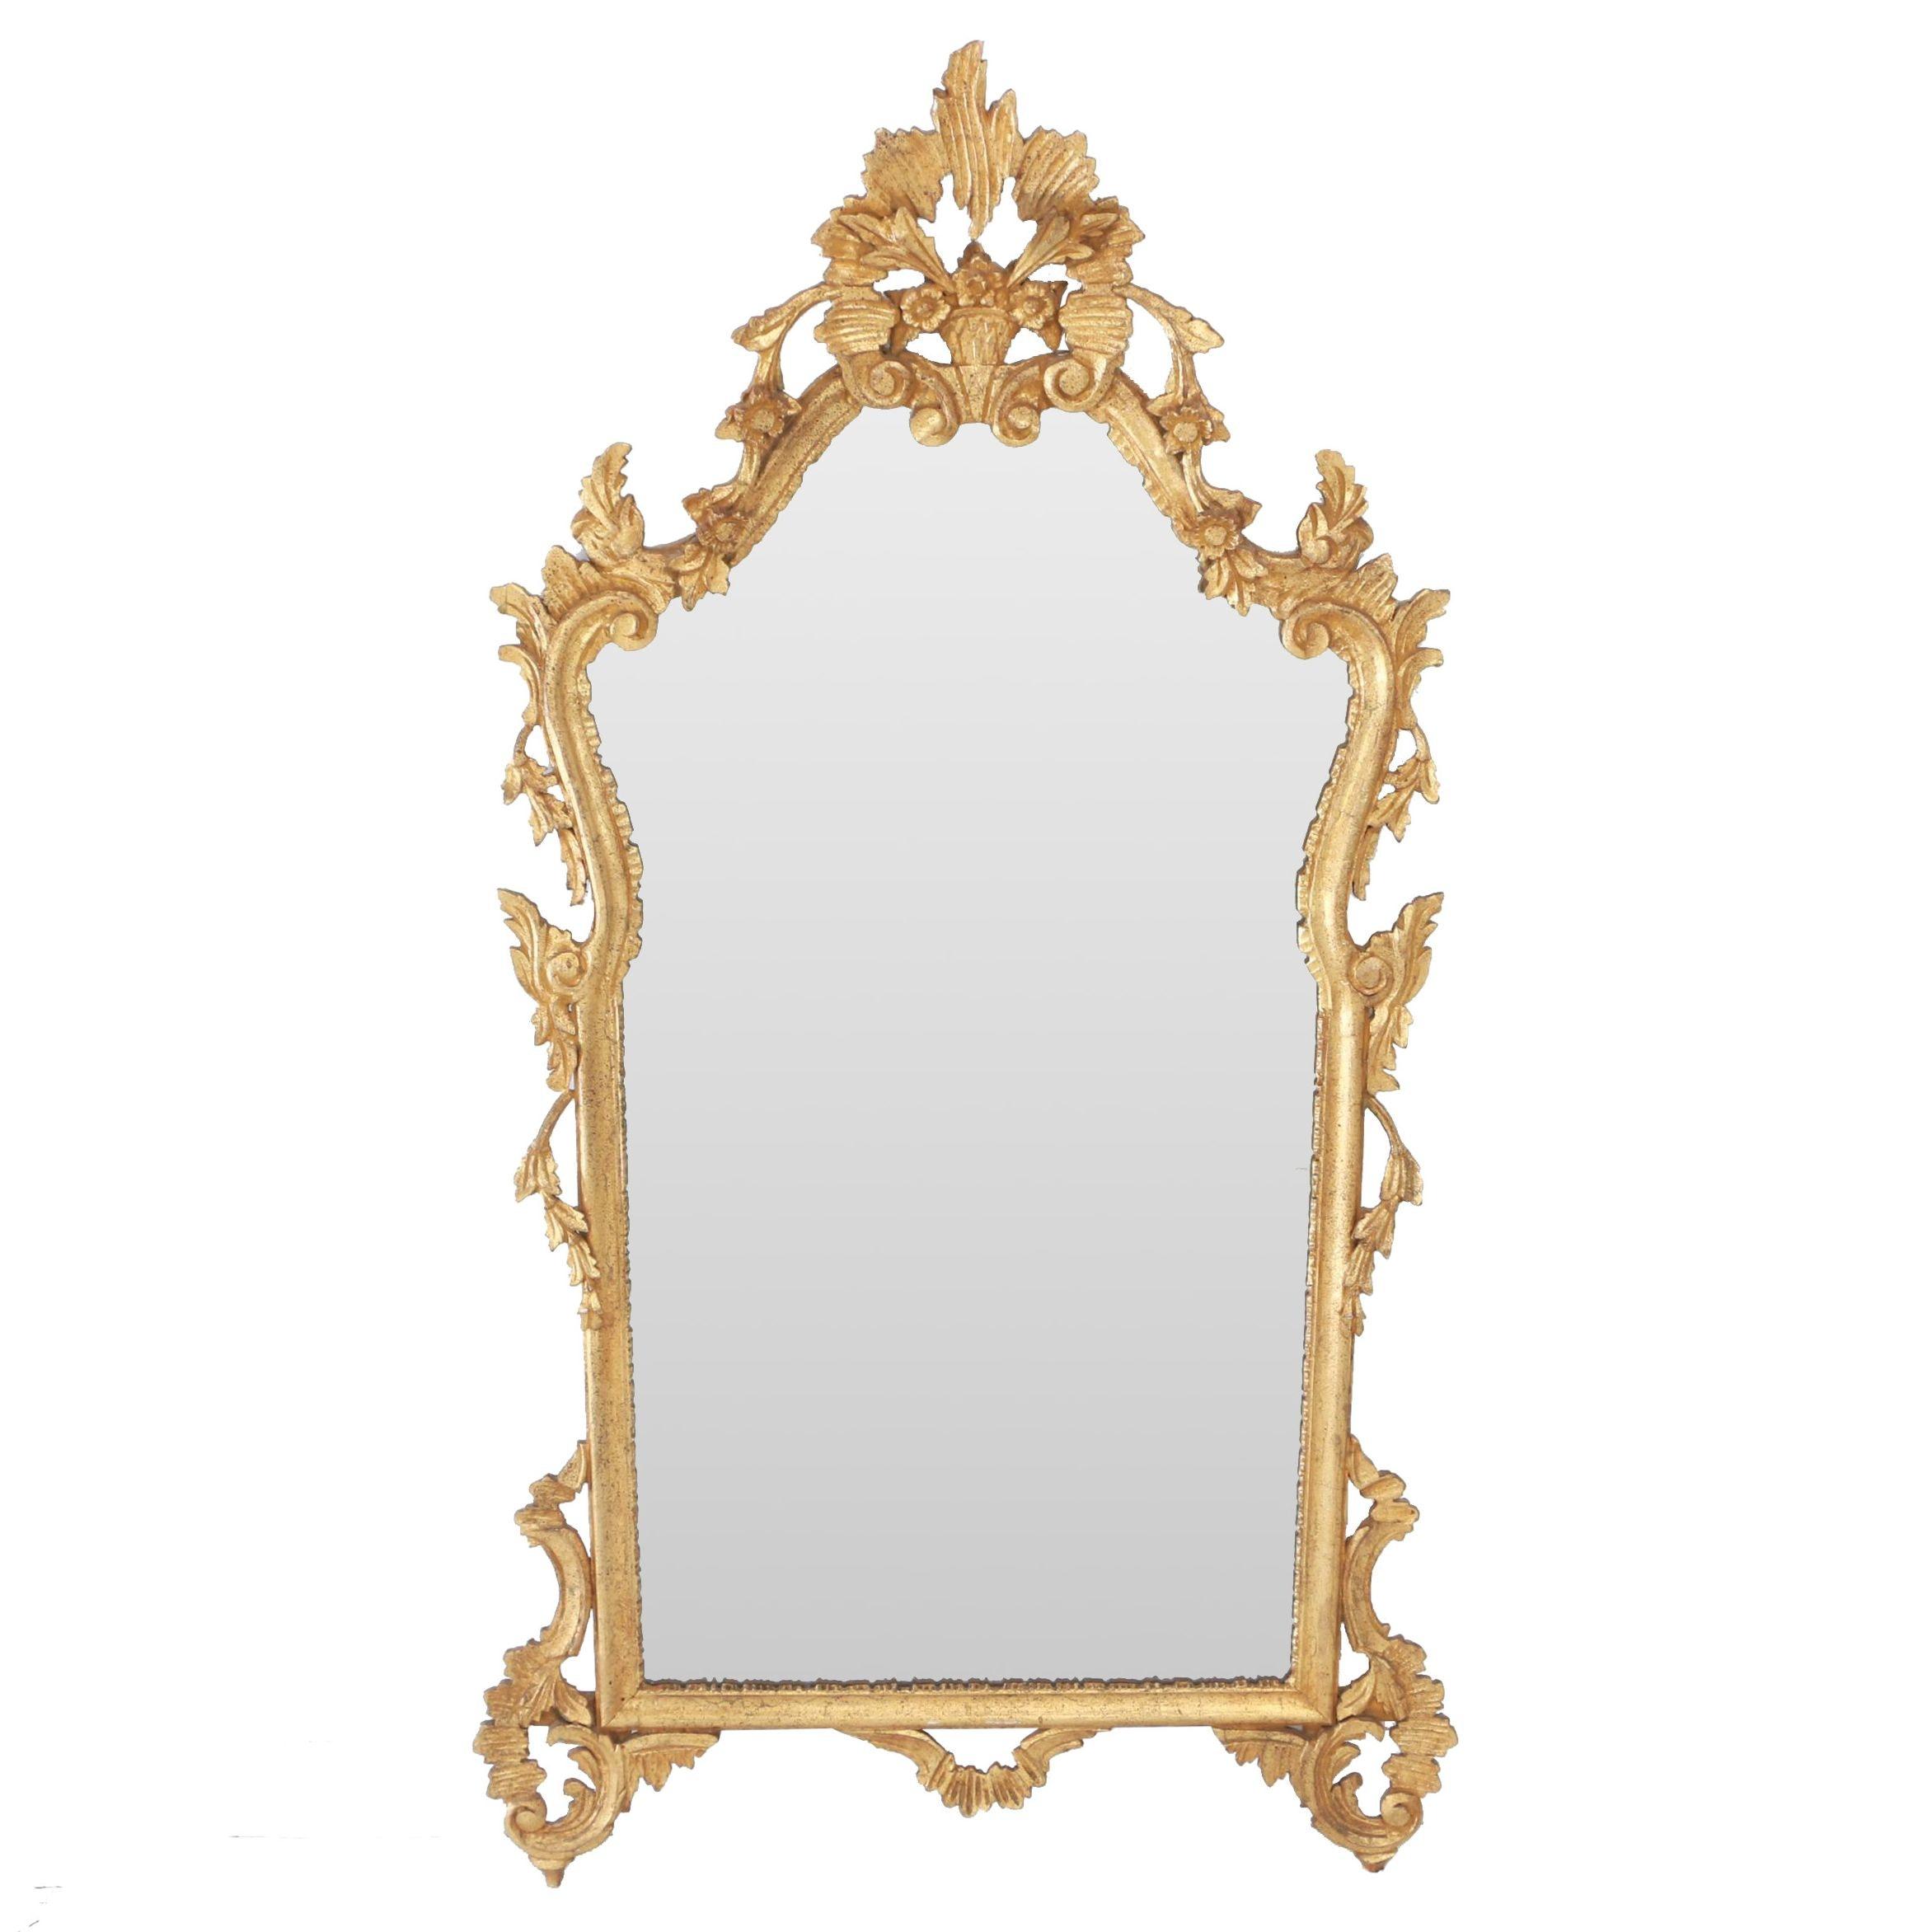 Italian Rococo Style Giltwood Mirror, 20th Century